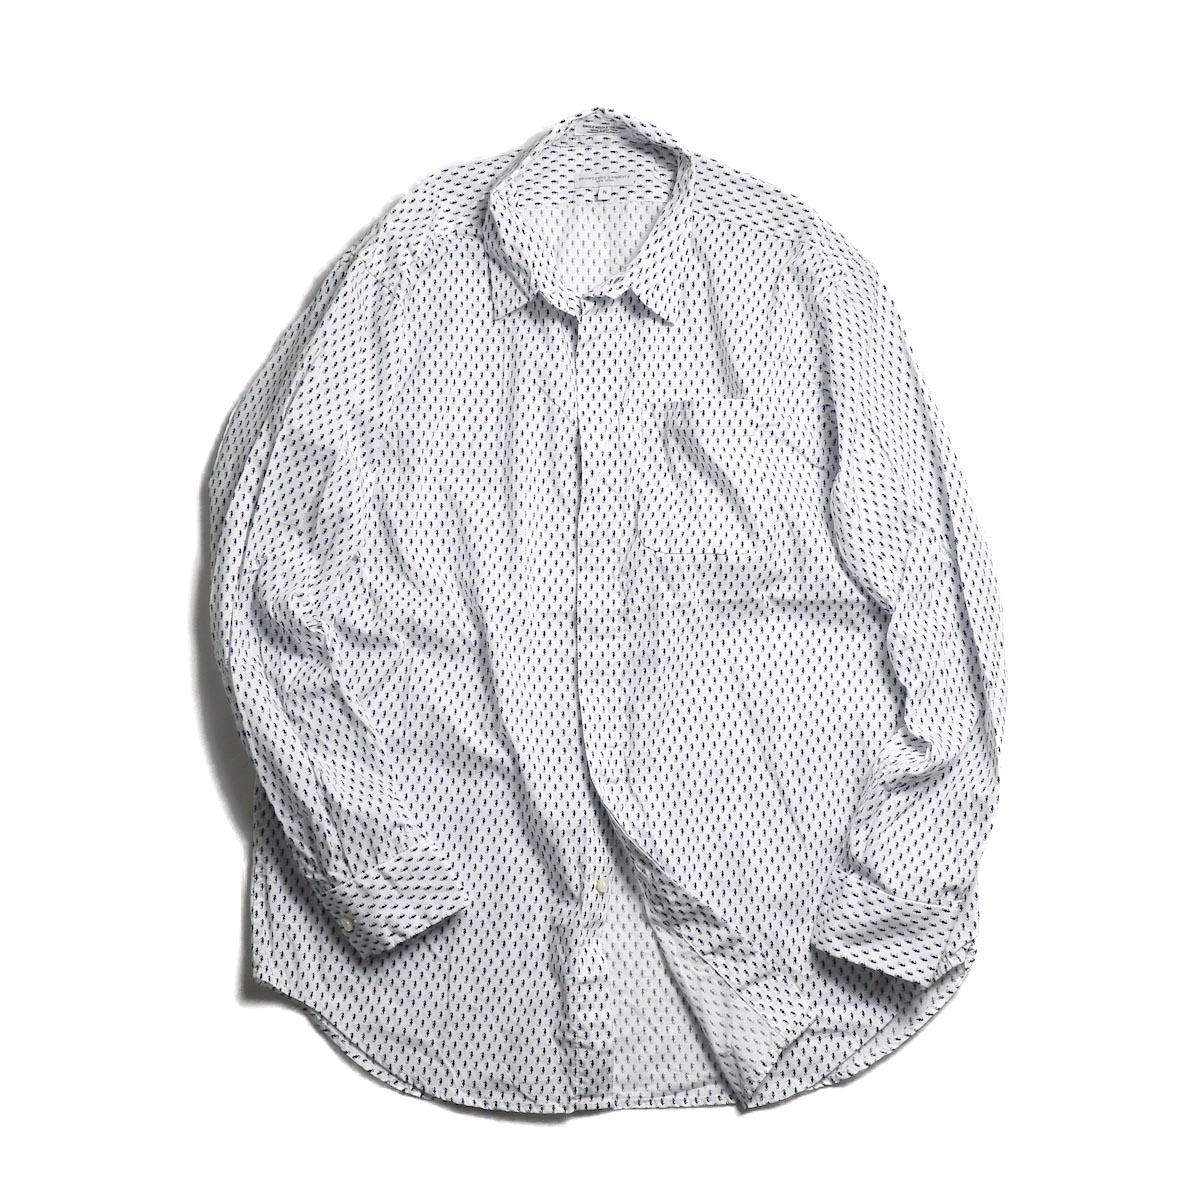 ENGINEERED GARMENTS / Short Collar Shirt -Seahorse Print (Navy/White)